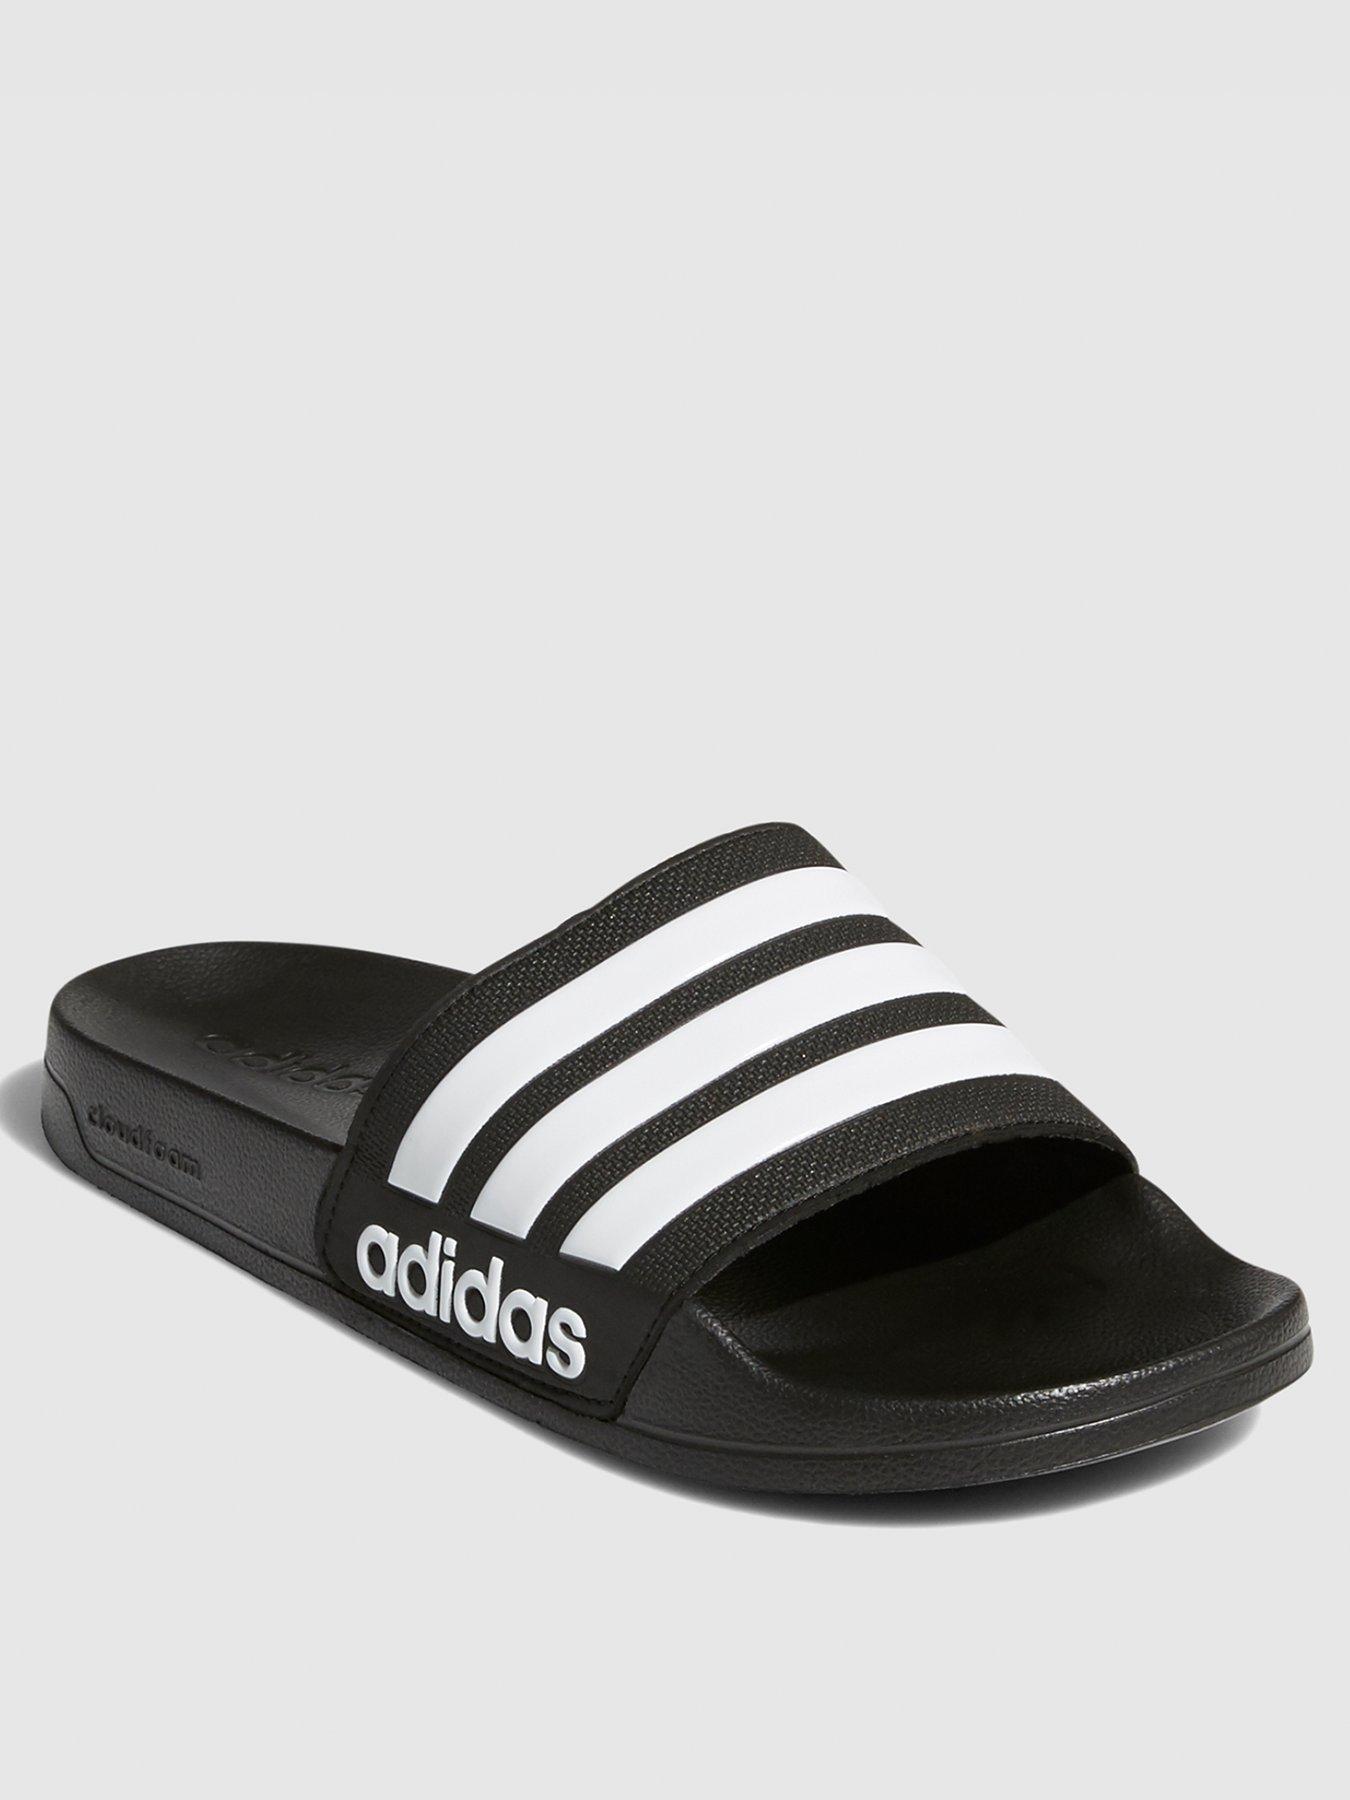 Adidas   Flip flops \u0026 sandals   Shoes